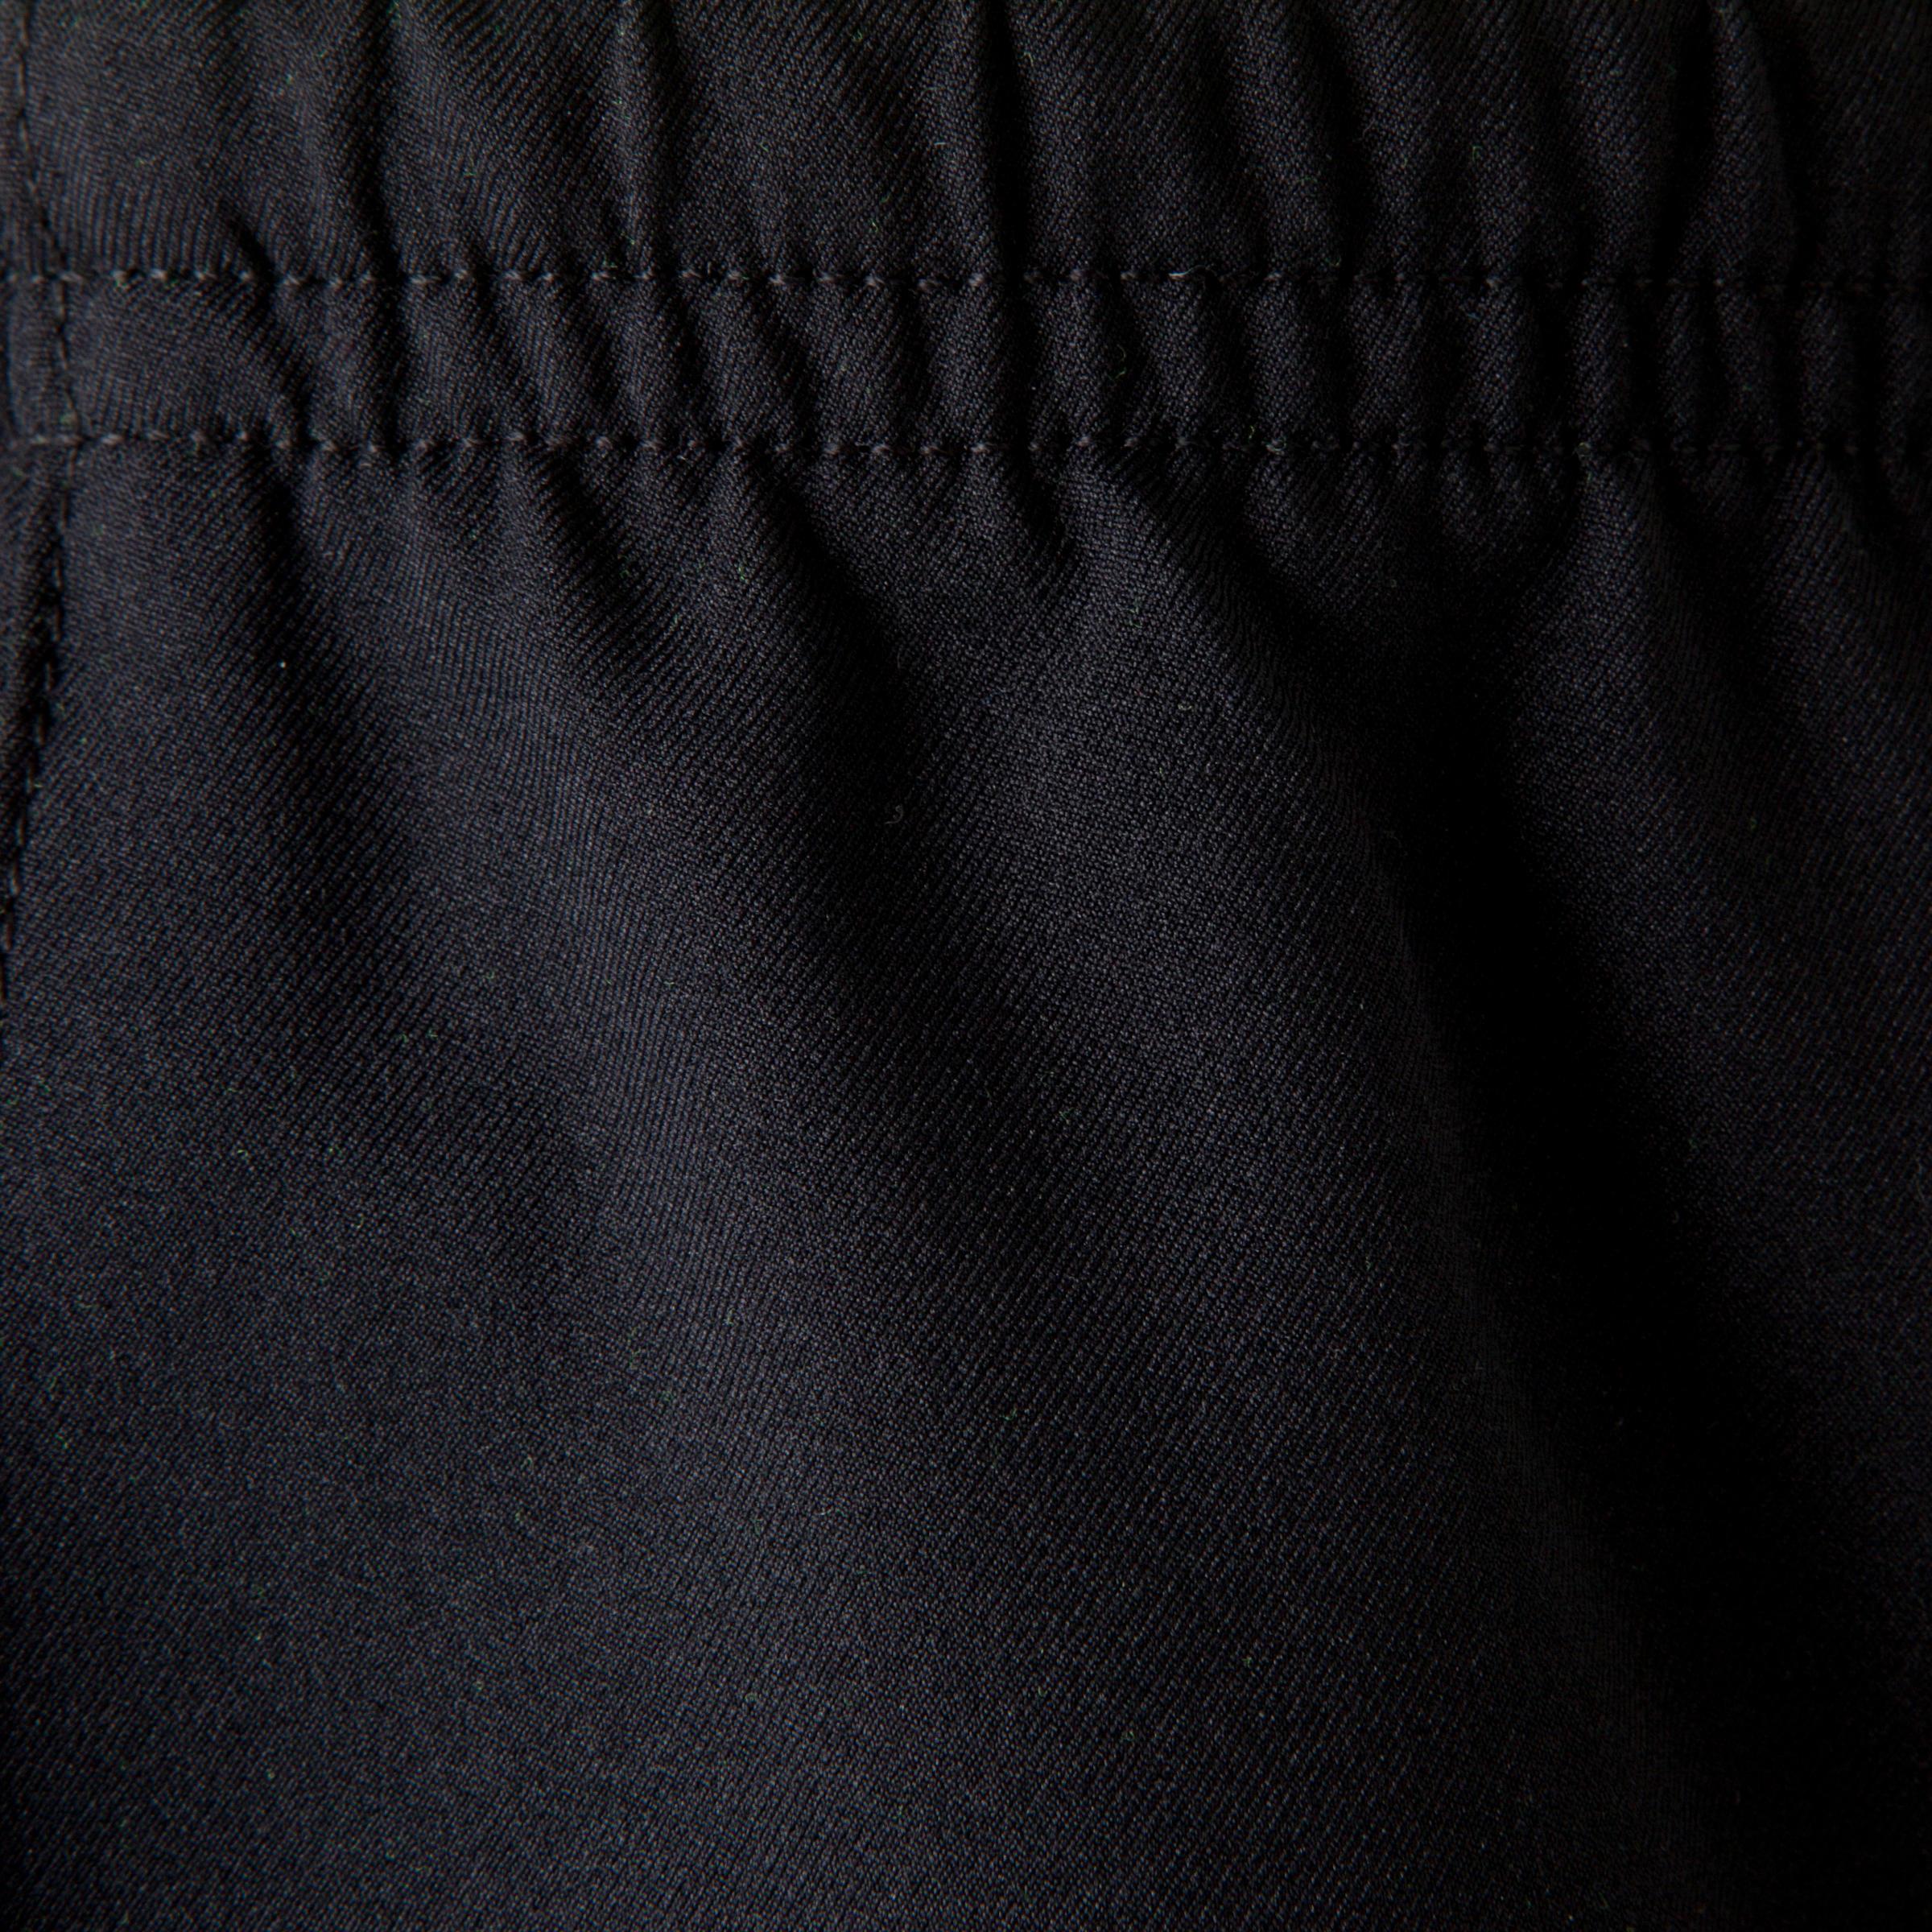 Kids' Football Shorts F500 - Black/Neon Yellow